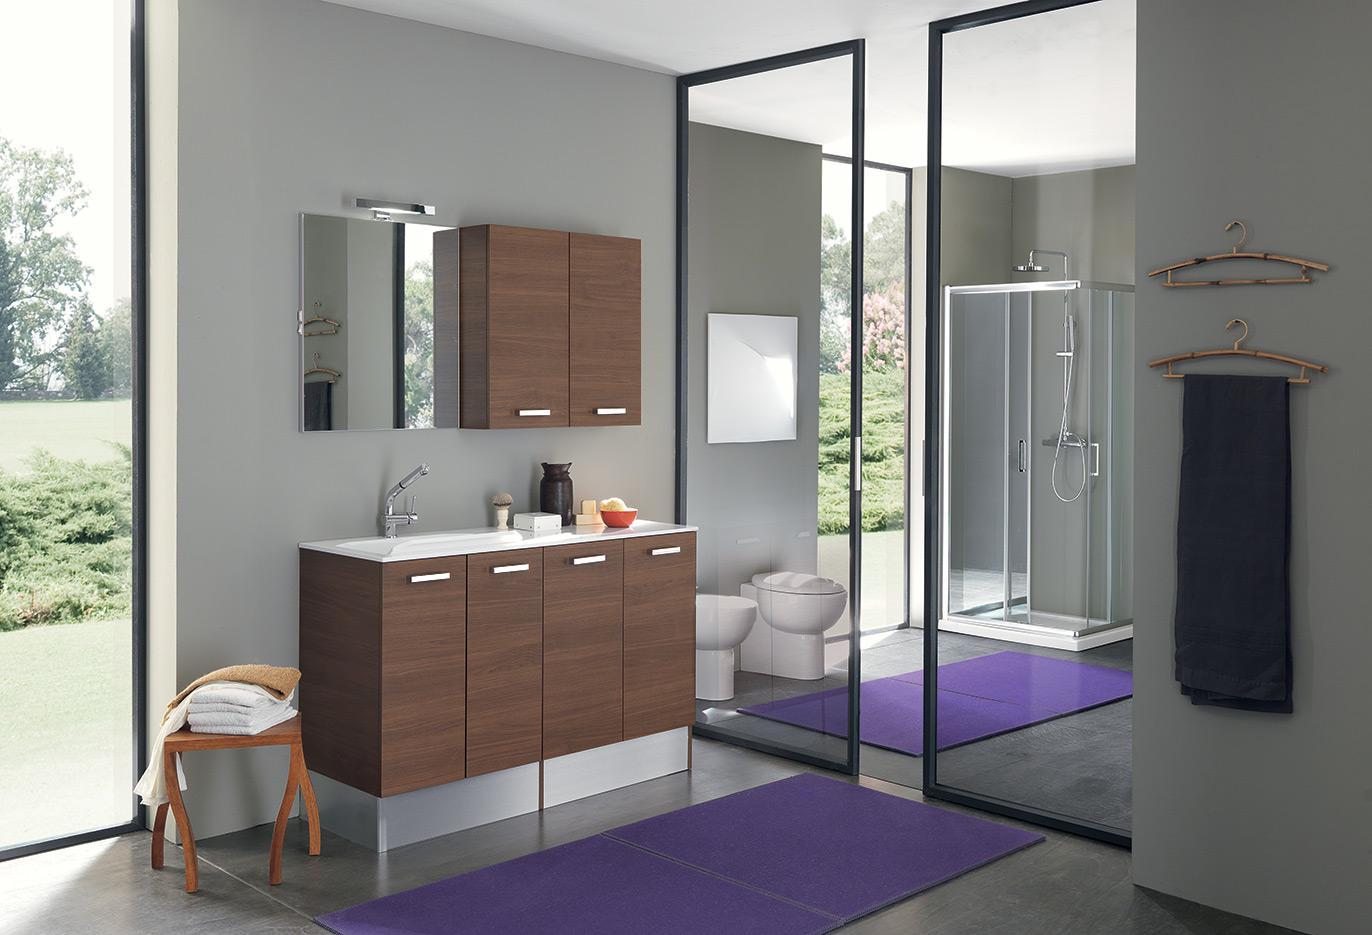 Kios mobili da bagno mobili da bagno edilceramiche di maccanò